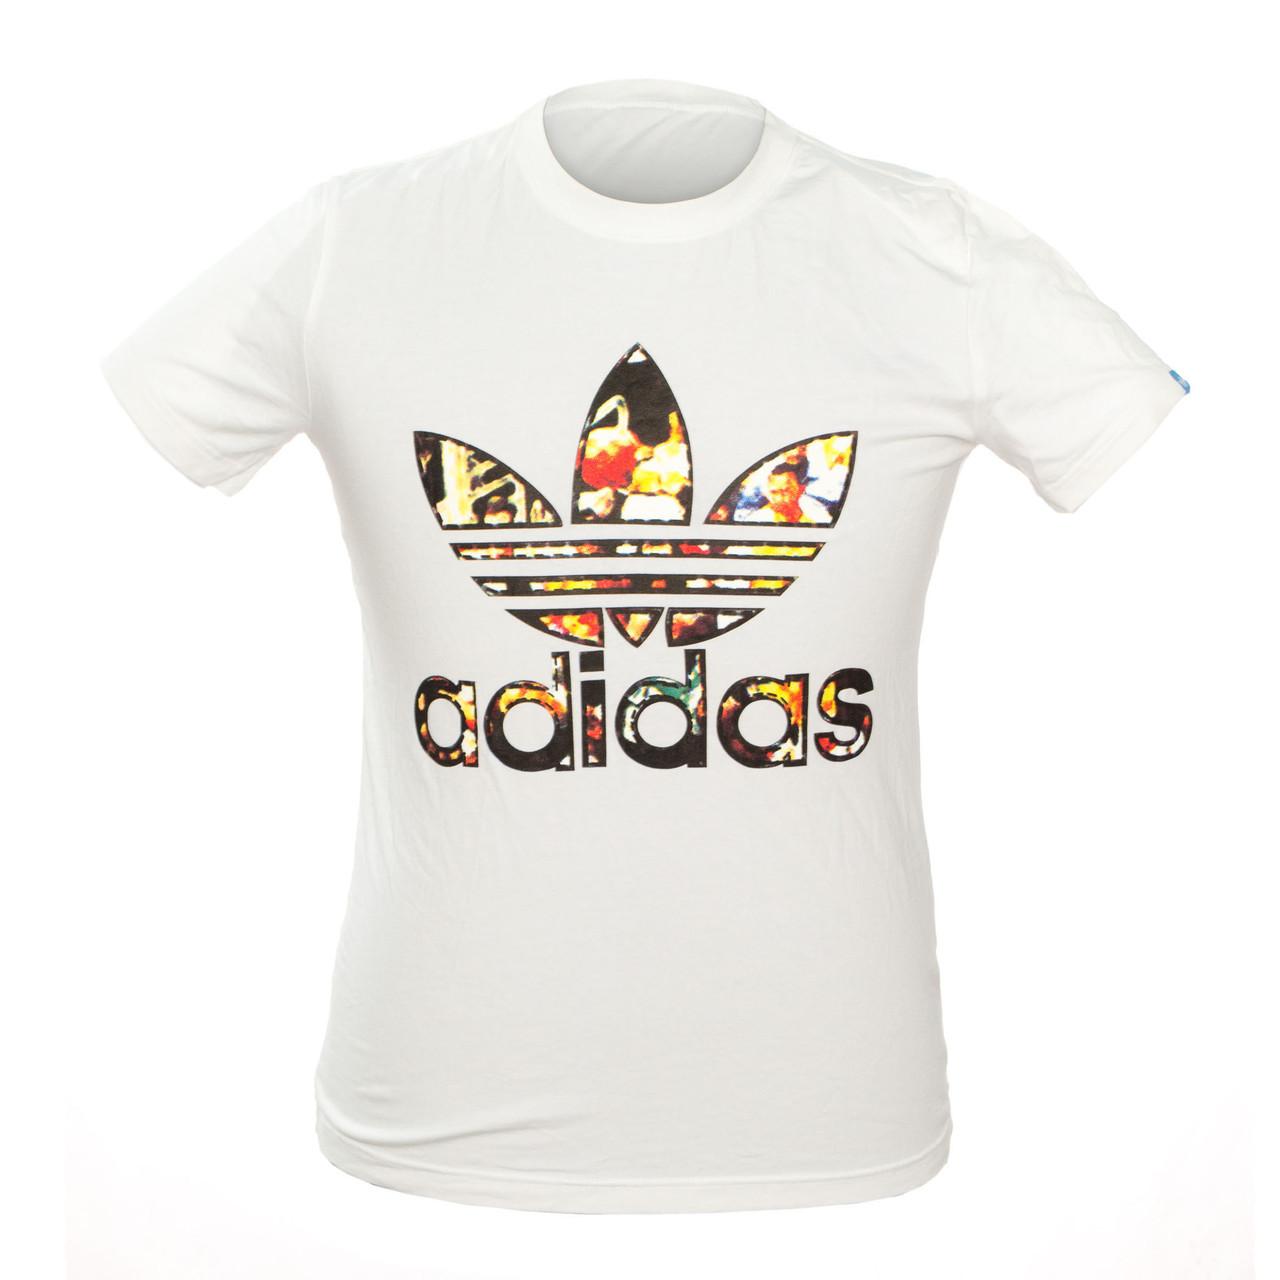 Чоловіча Футболка Adidas 101628494 M White